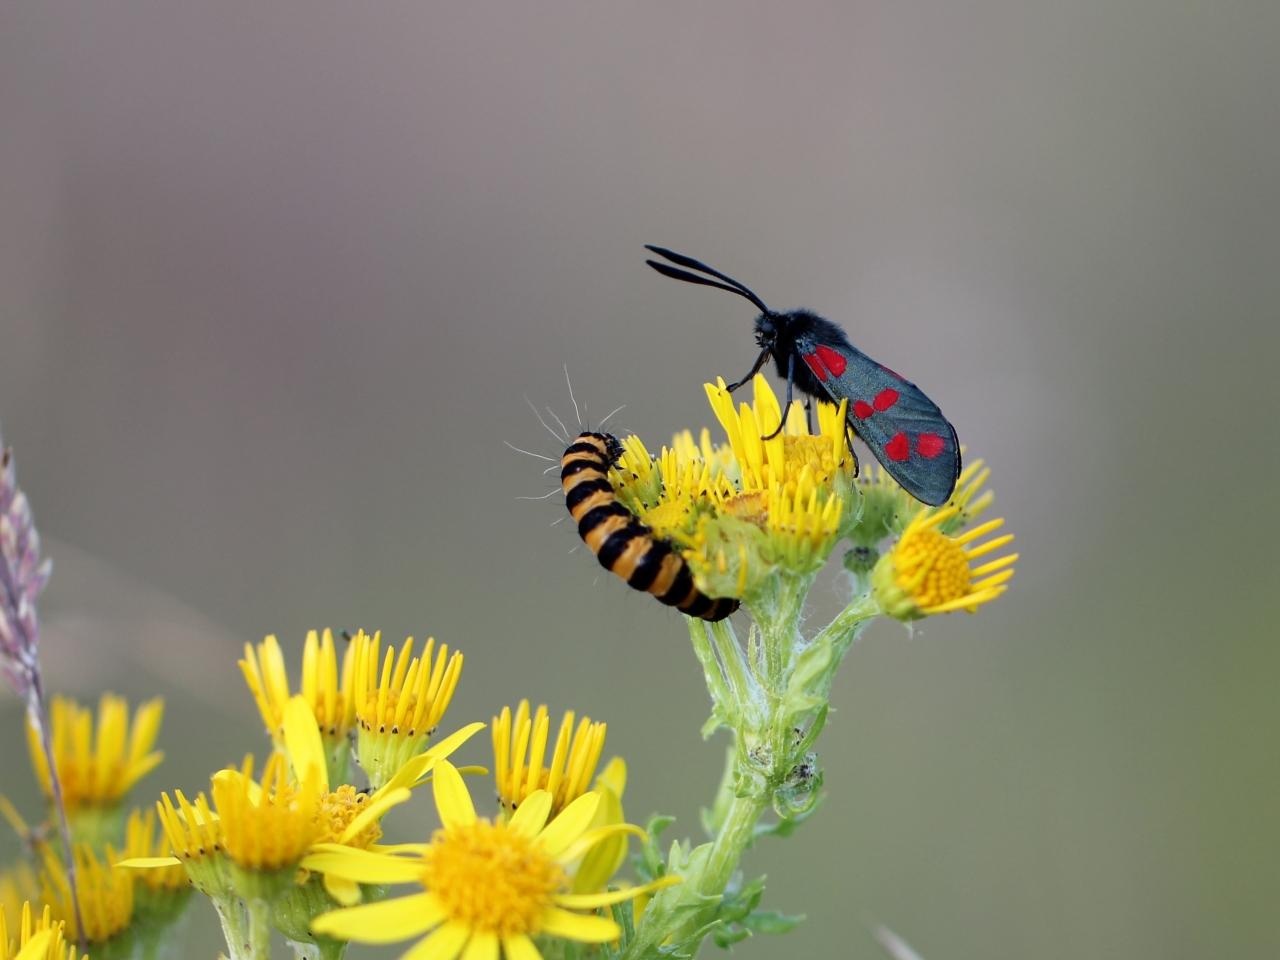 Una pareja de insectos - 1280x960